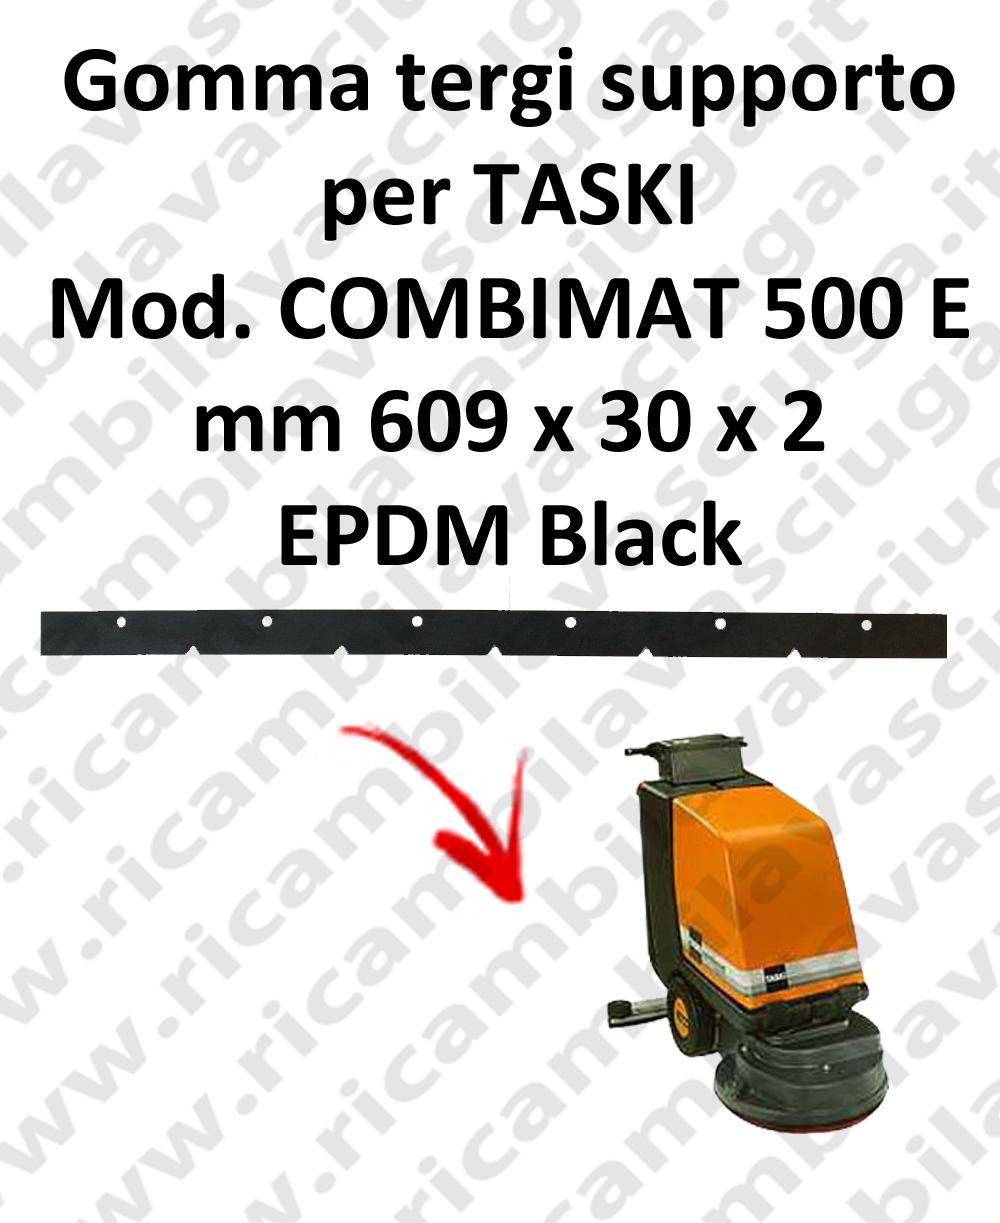 COMBIMAT 500 E Gomma tergi supporto per lavapavimenti TASKI modello